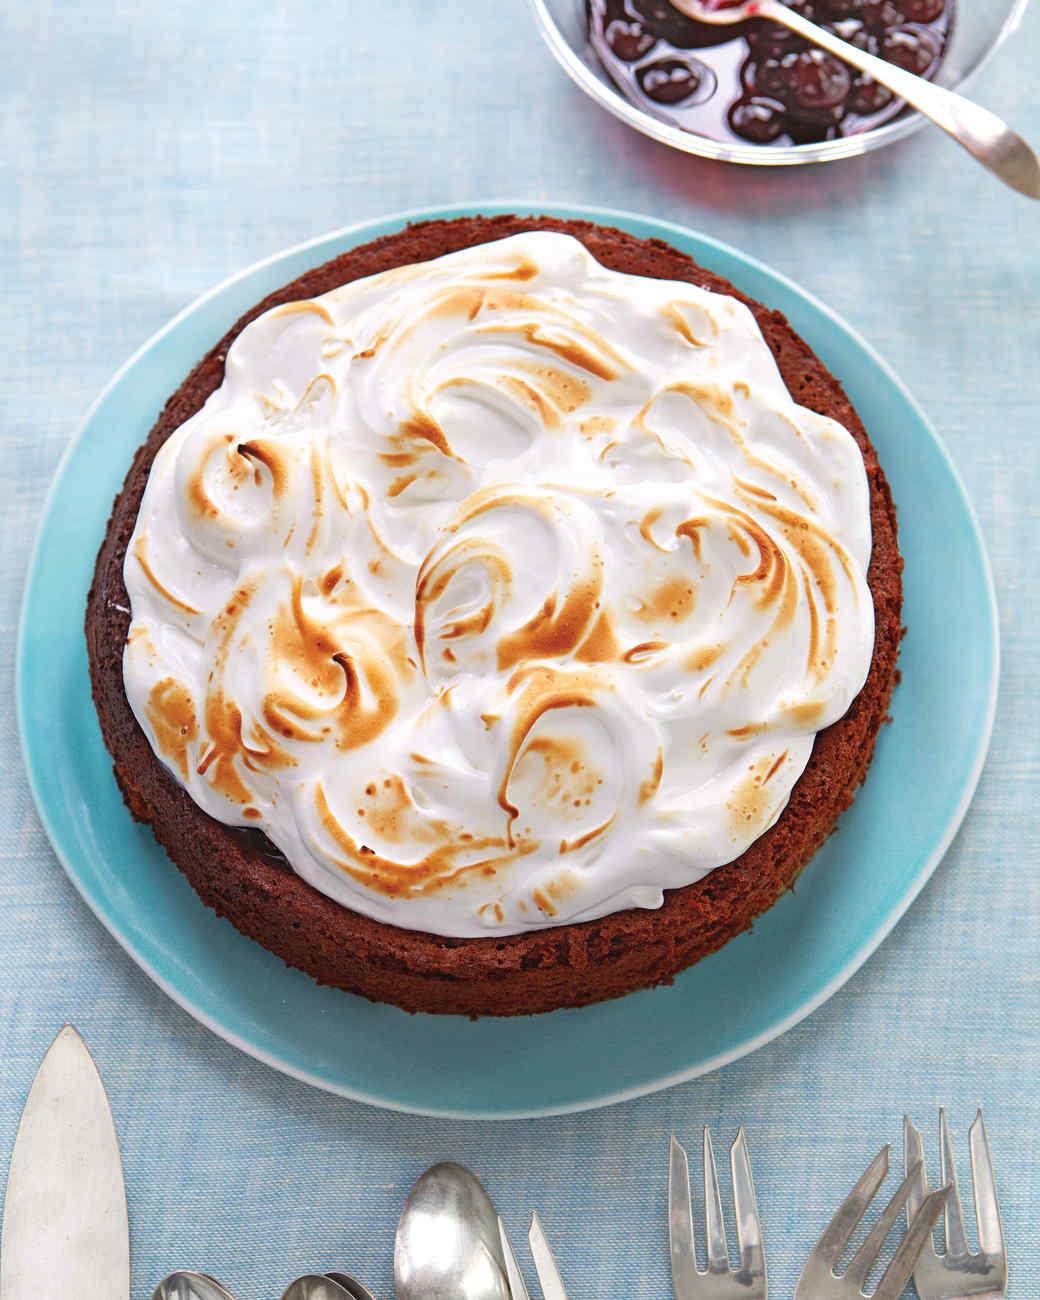 Flourless Chocolate-Almond Torte with Cherry Preserves and Kirsch Meringue